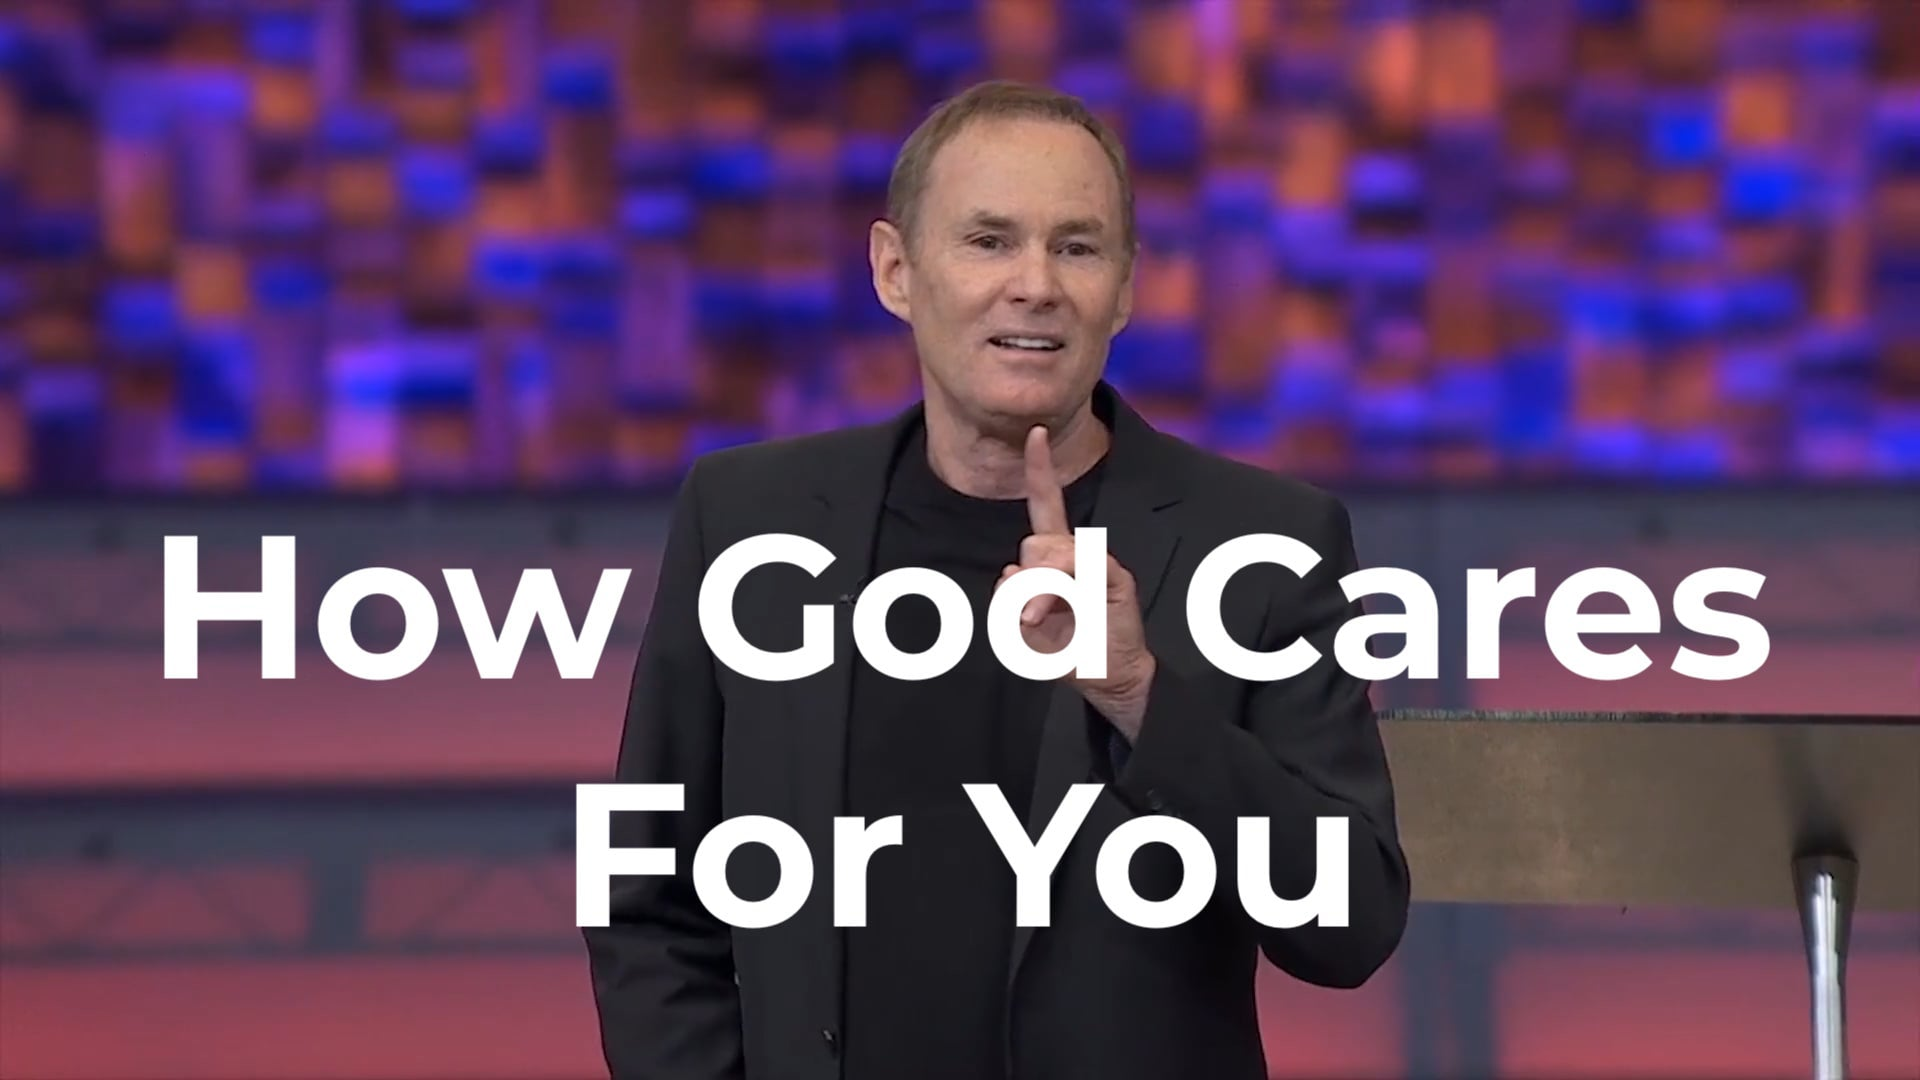 How God cares for you